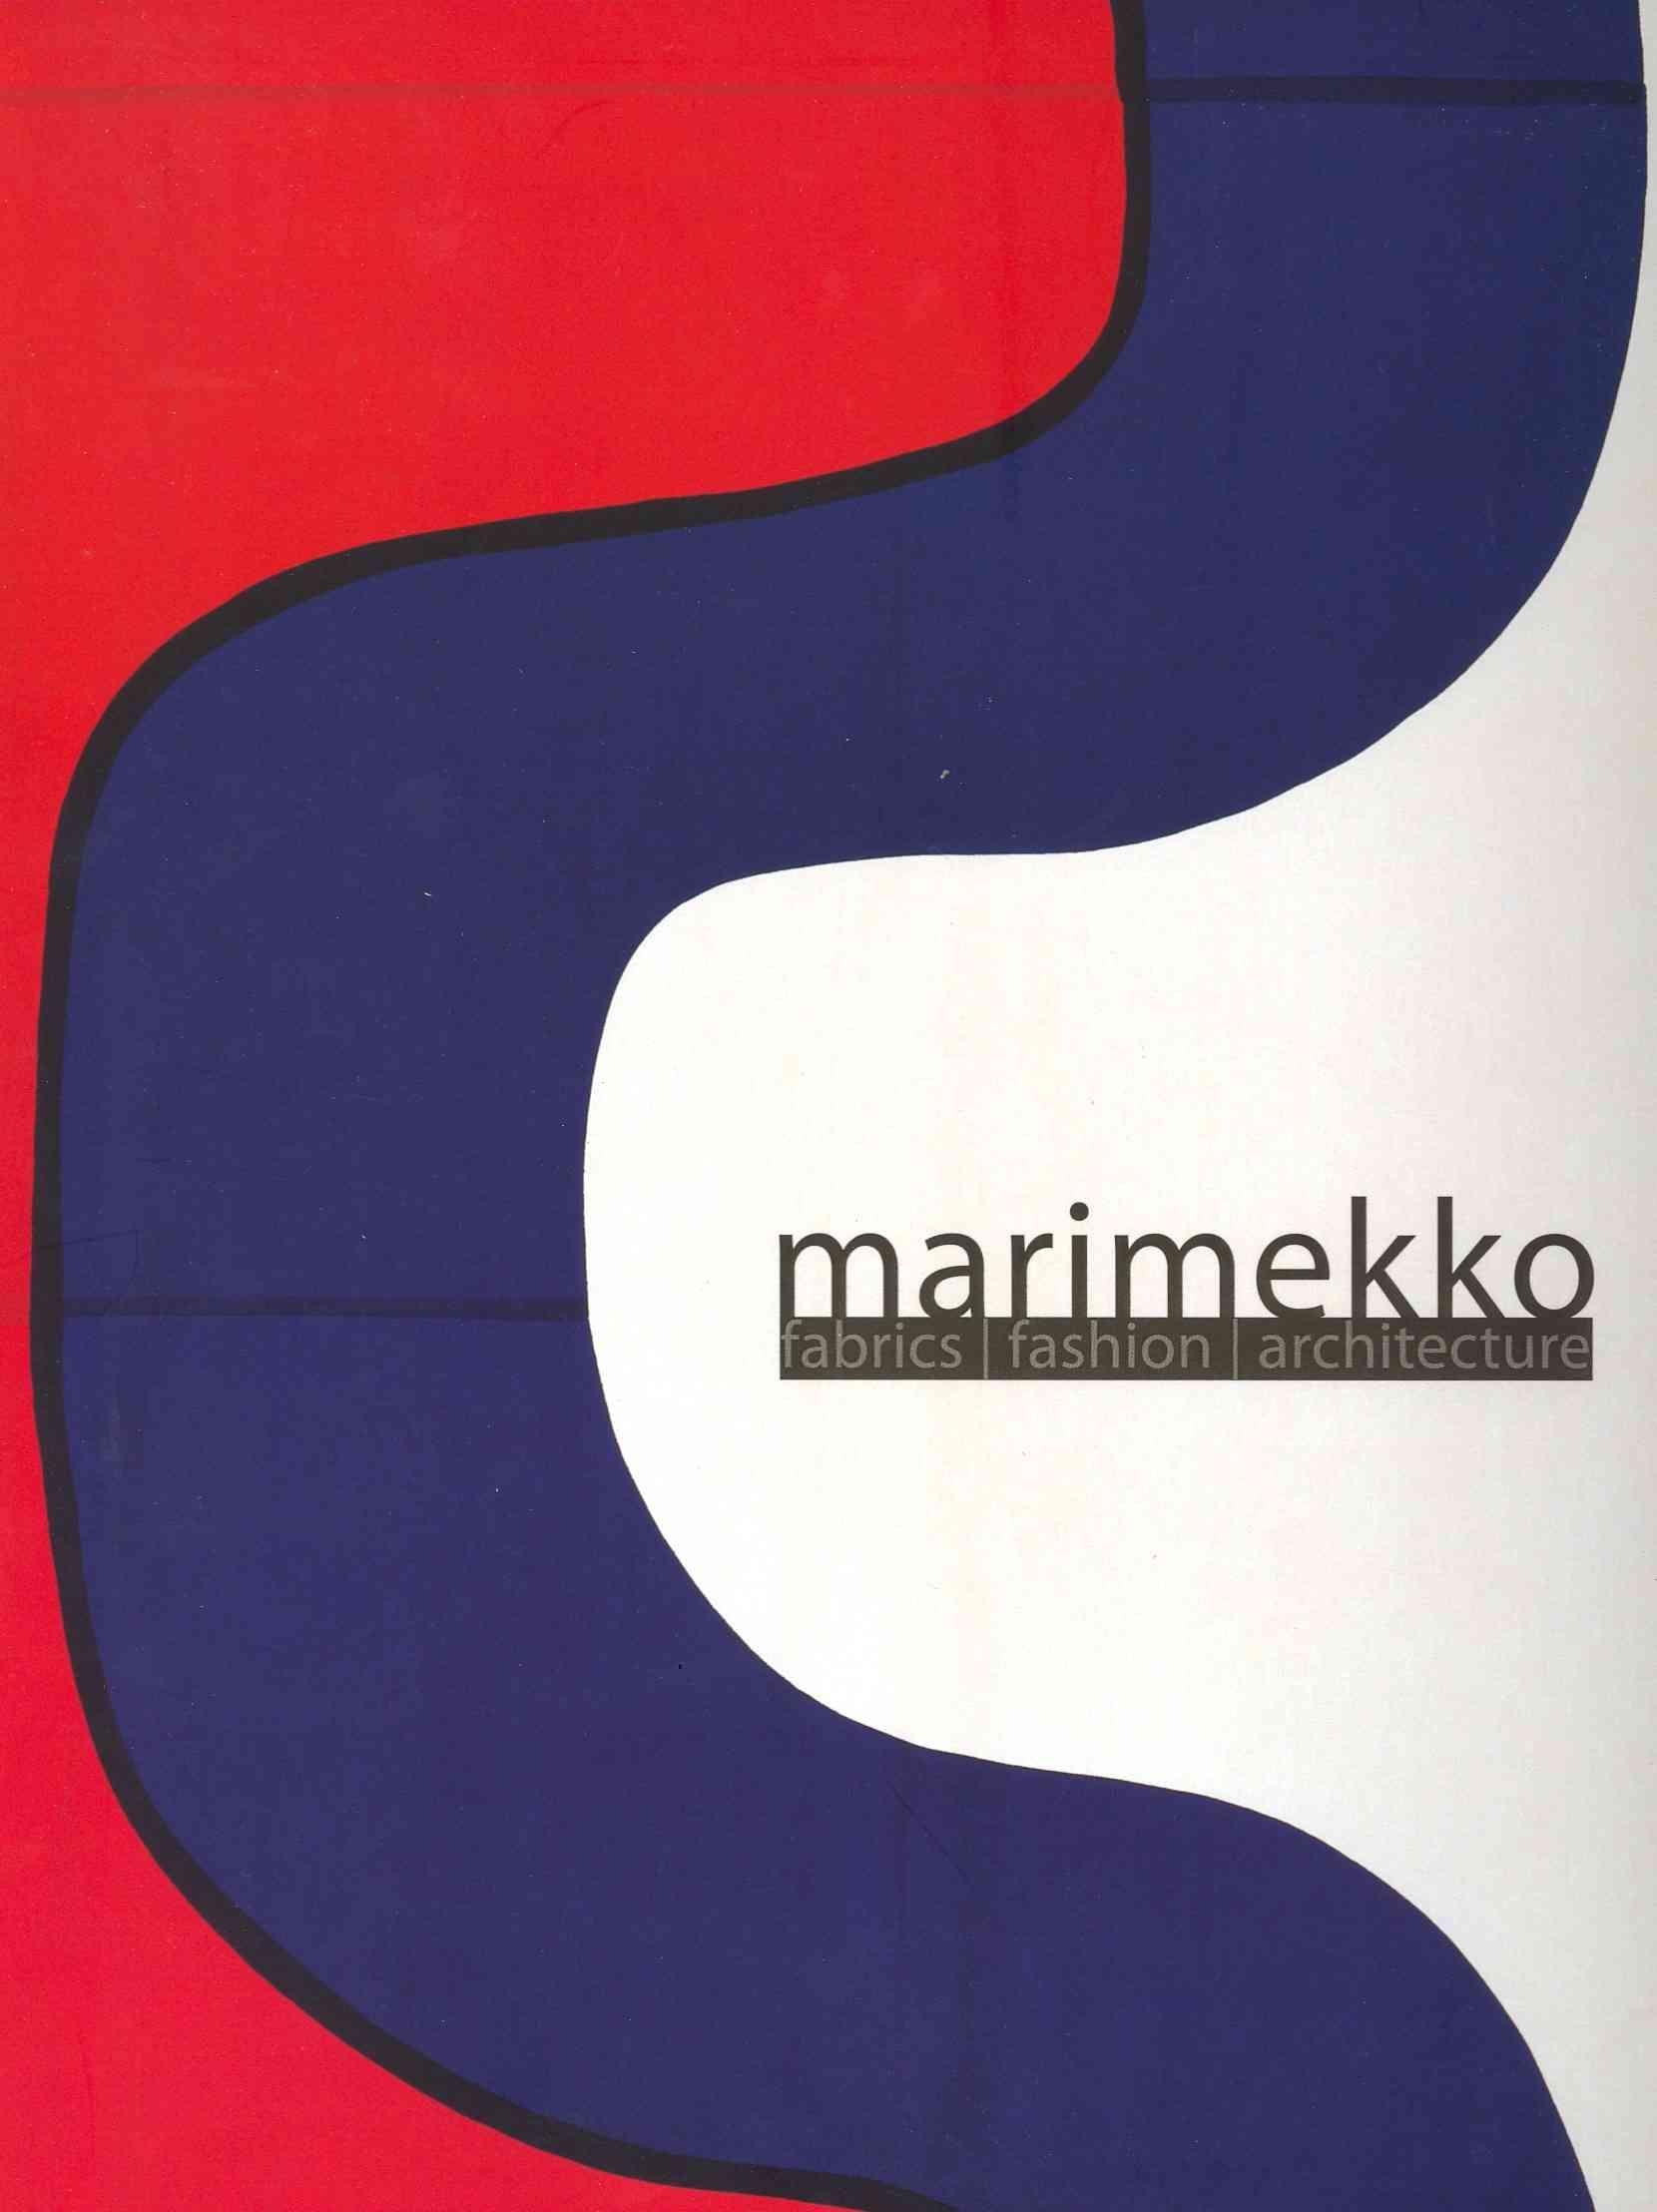 Marimekko (Paperback)